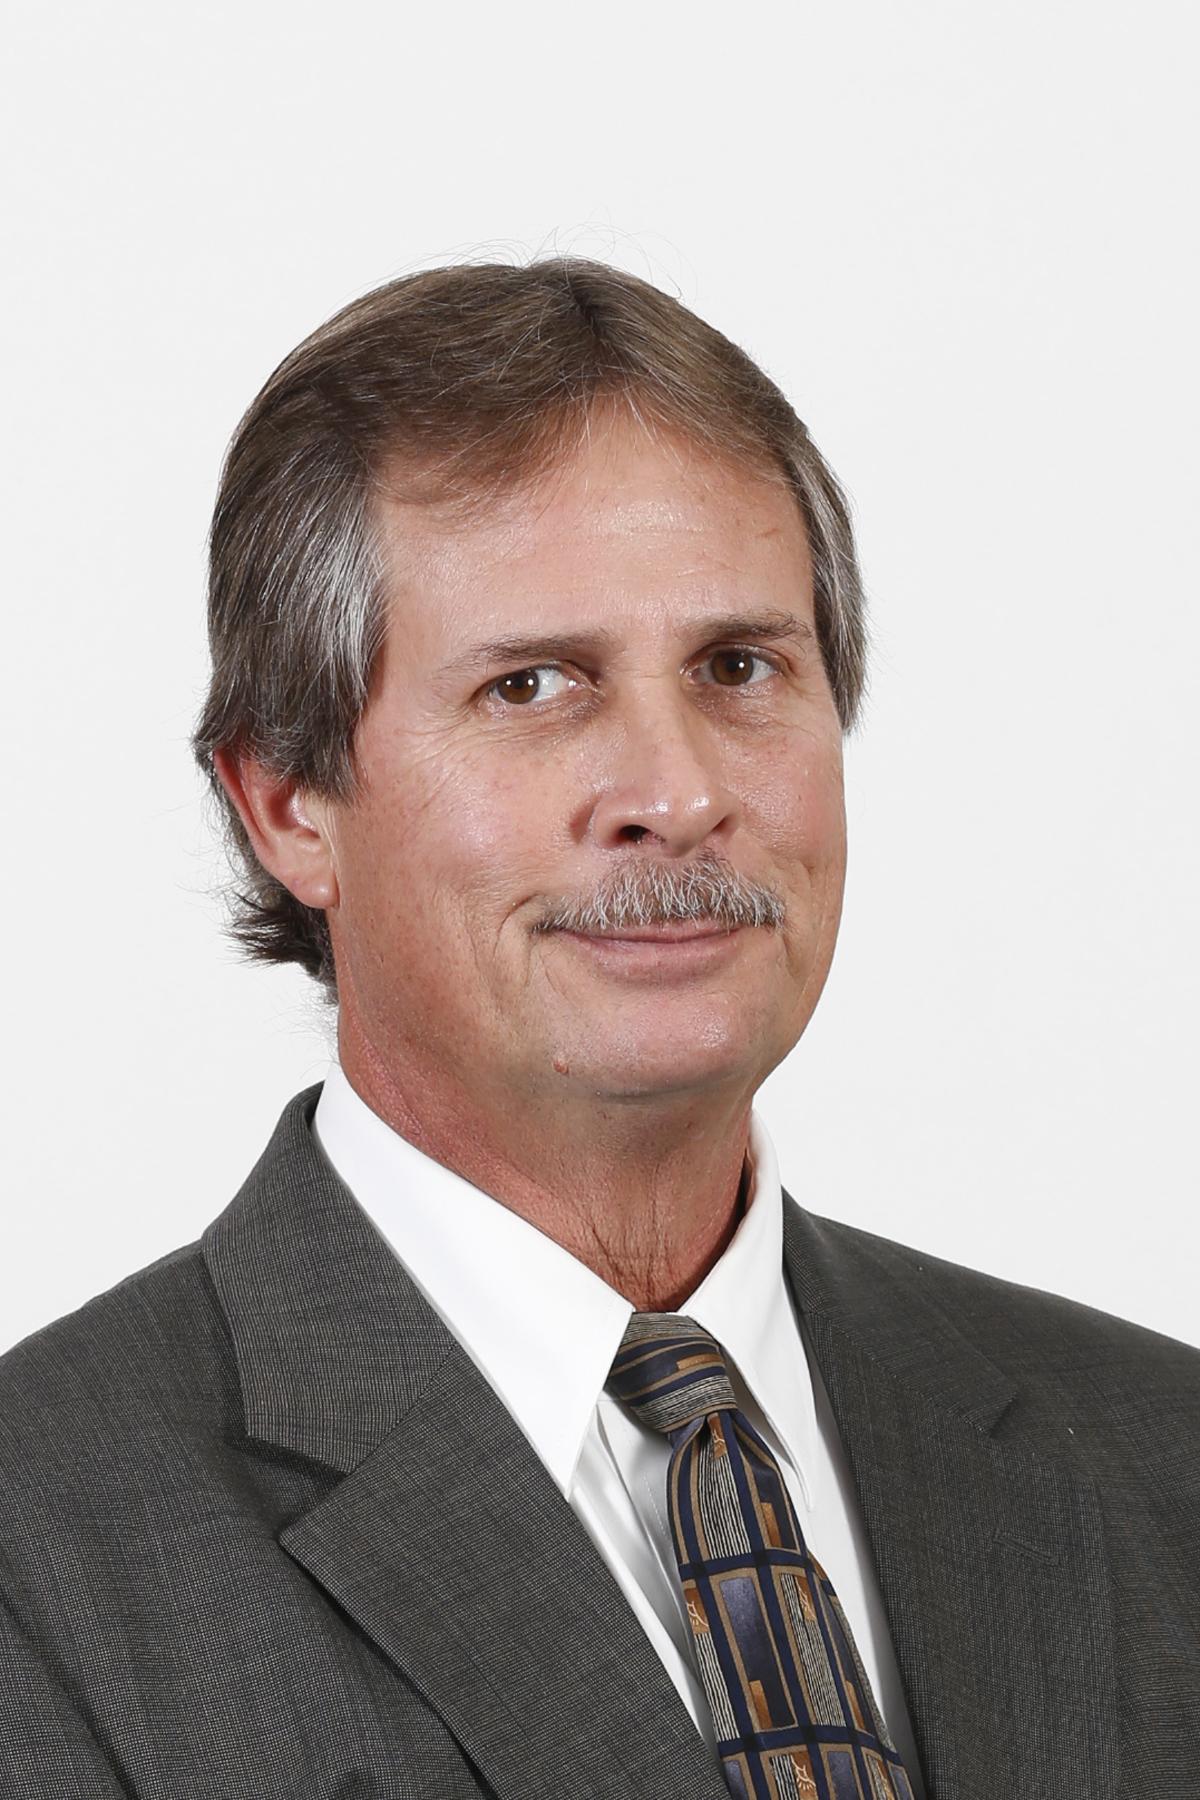 Randy Thomas, Council Liaison